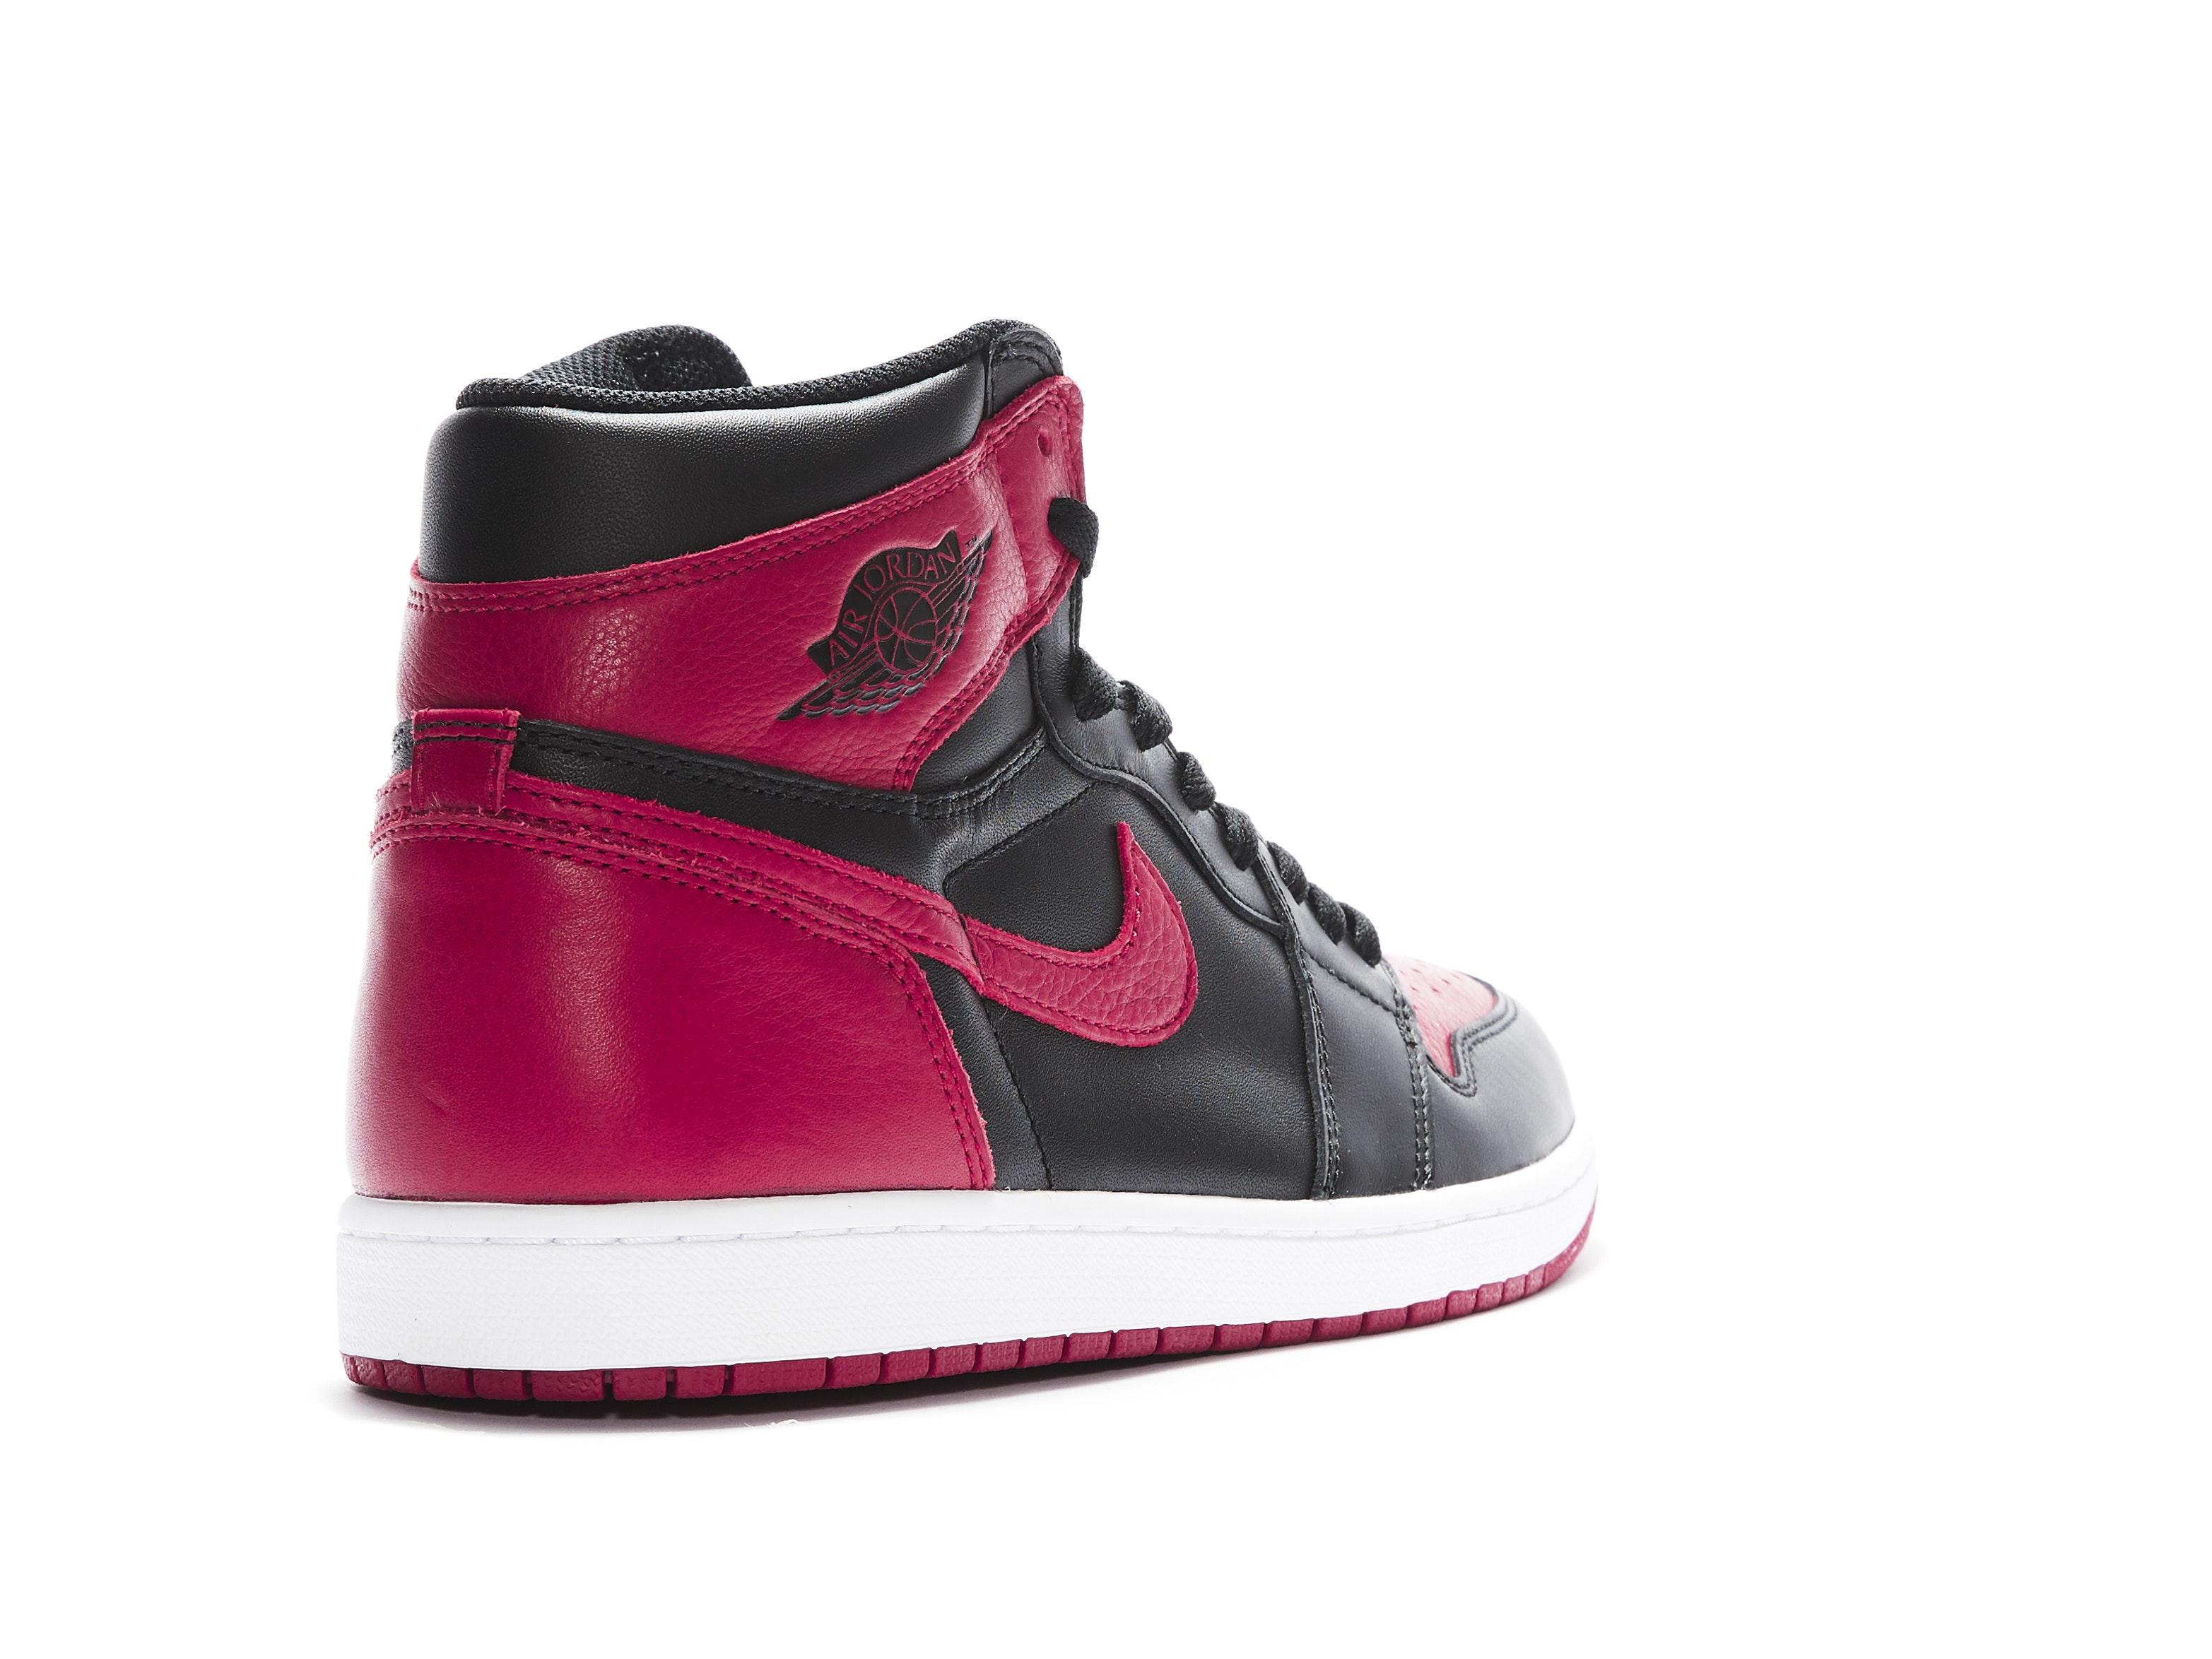 4b01e4e47 Shop Air Jordan 1 Retro High OG Banned Online | Laced